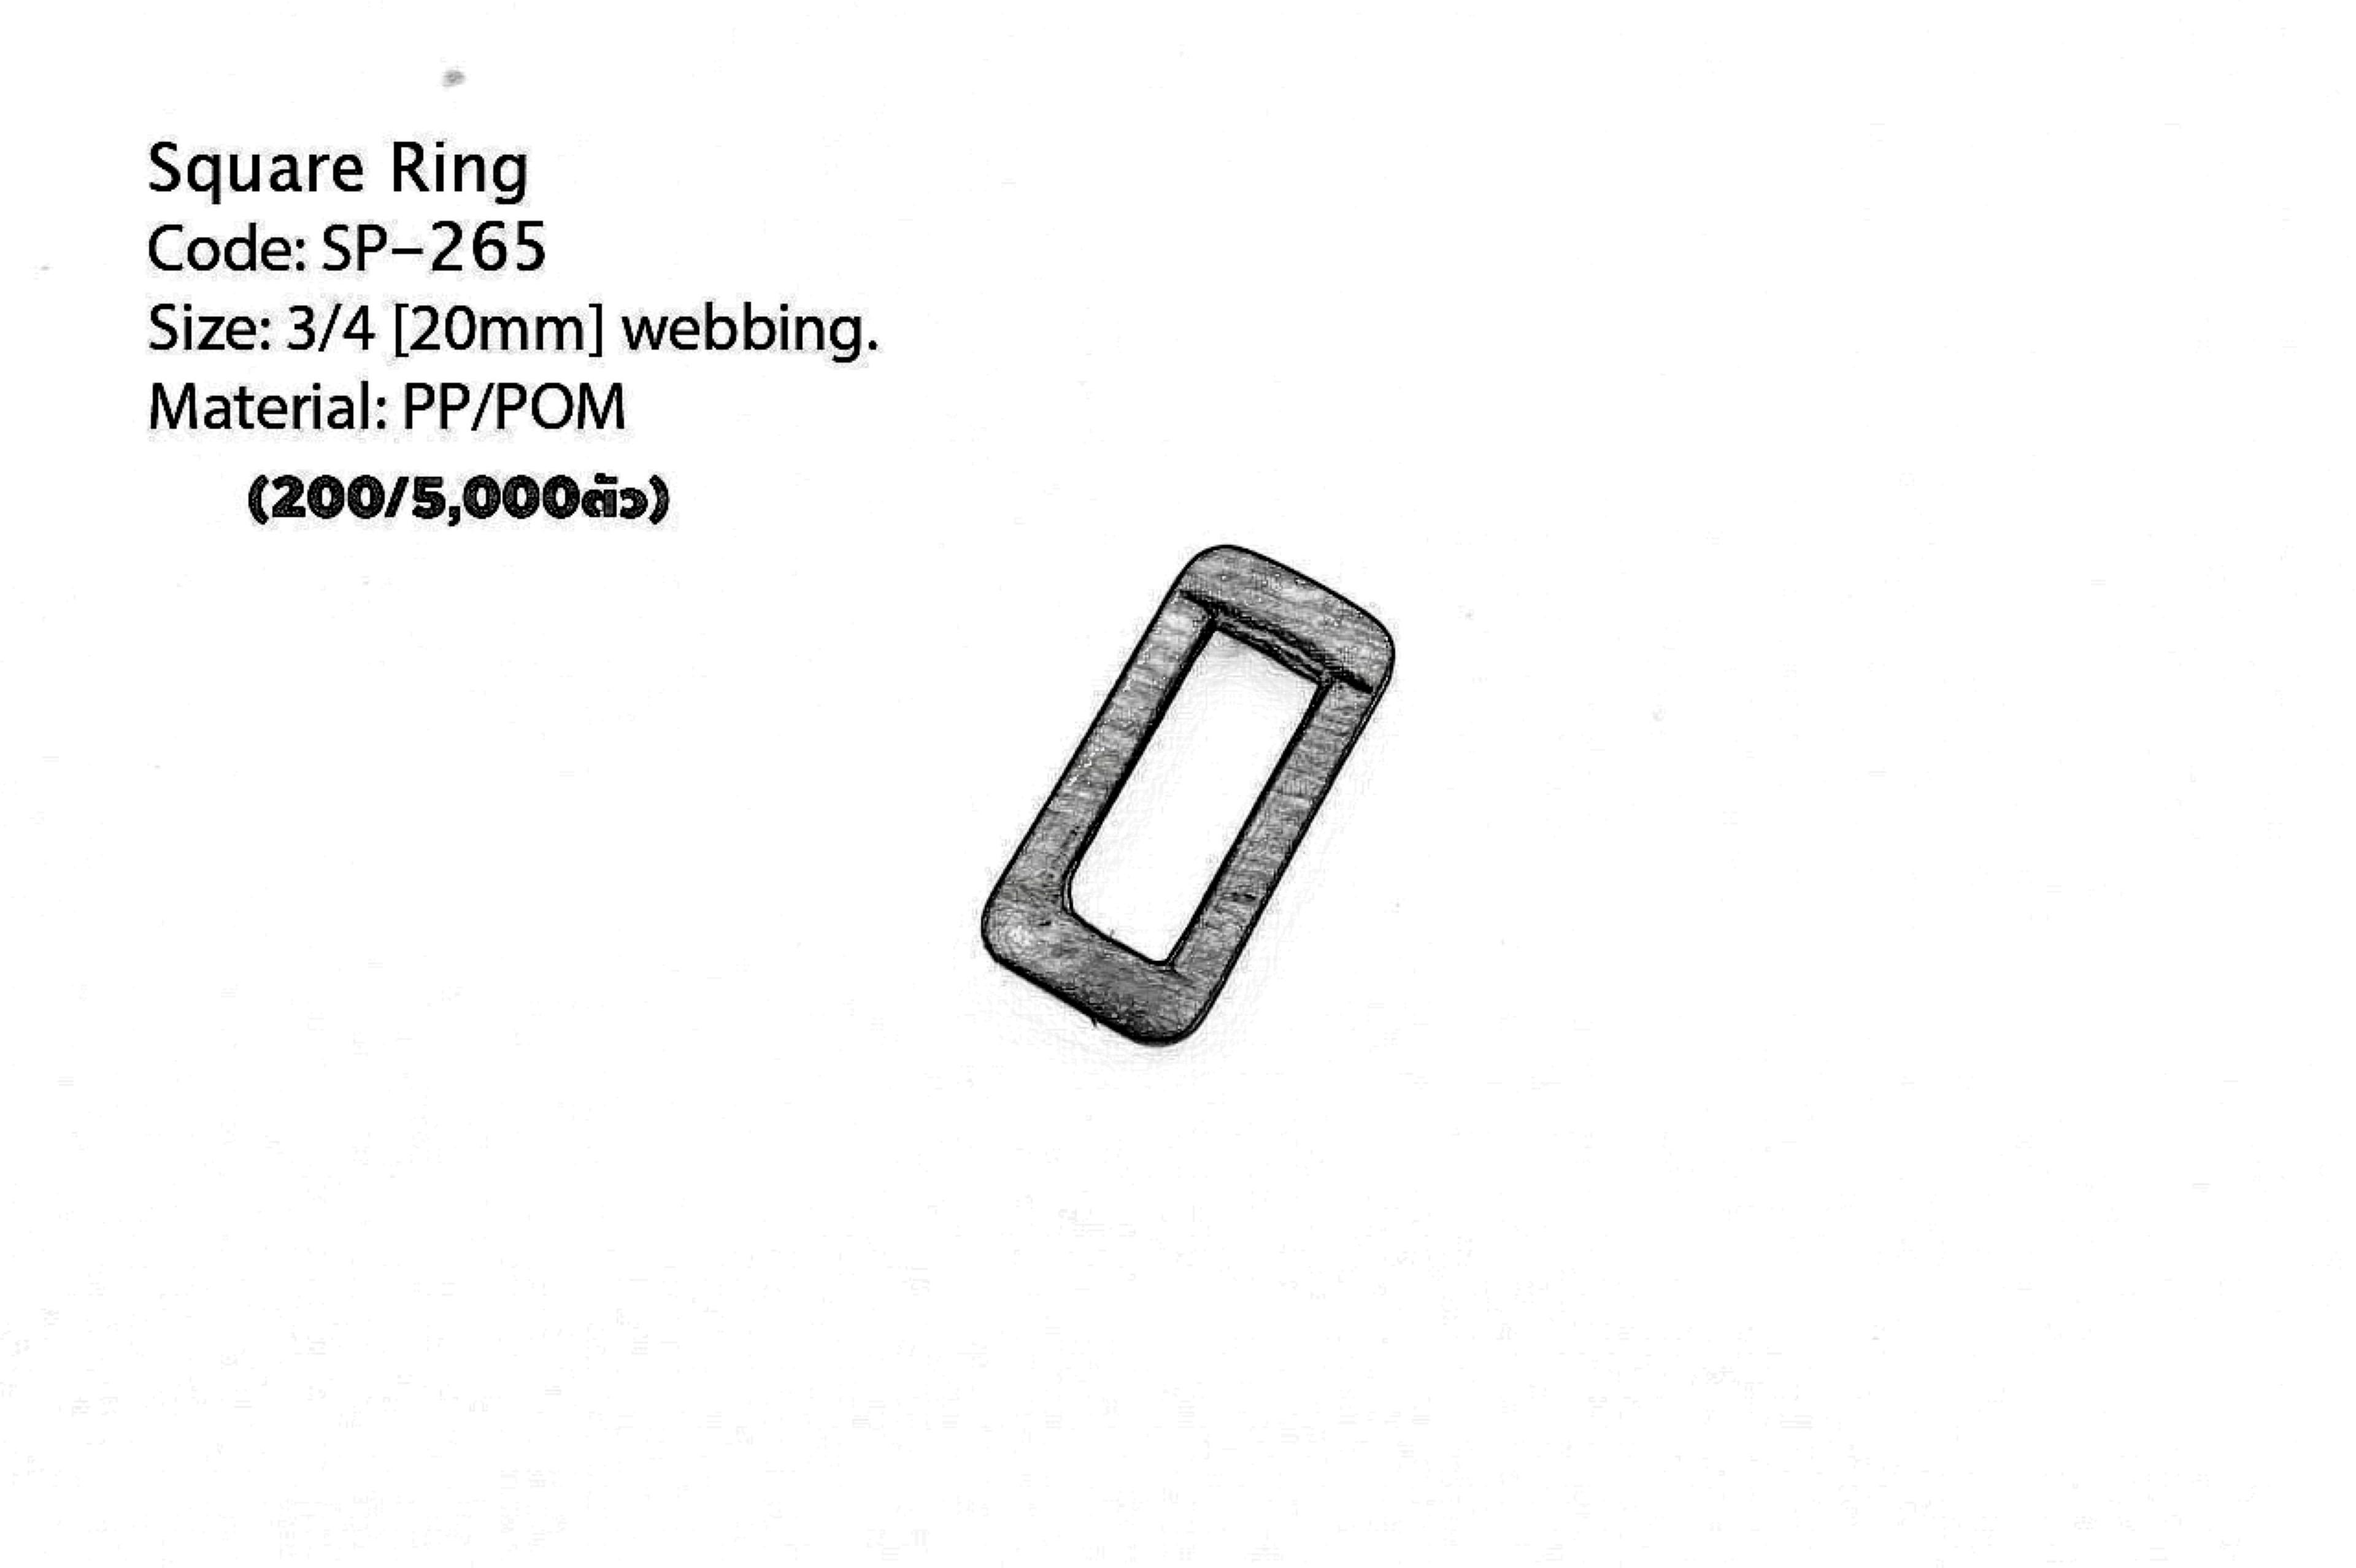 Square Ring 3/4